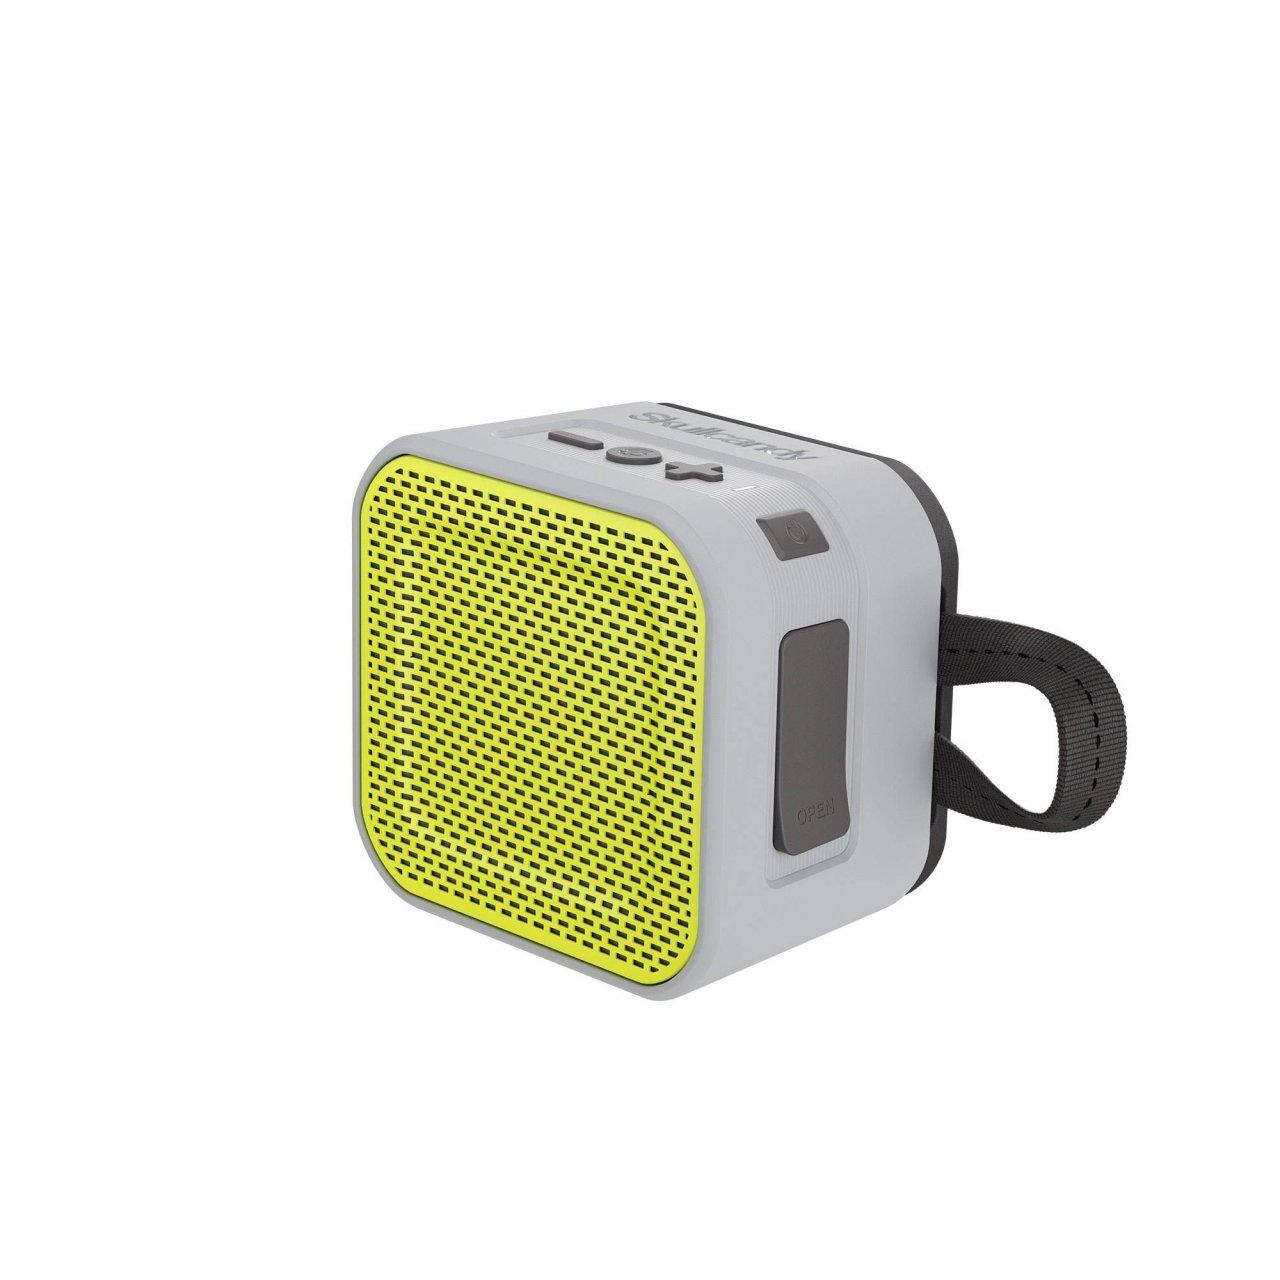 Small Bluetooth Speaker Barricade Mini Skullcandy Musik Box